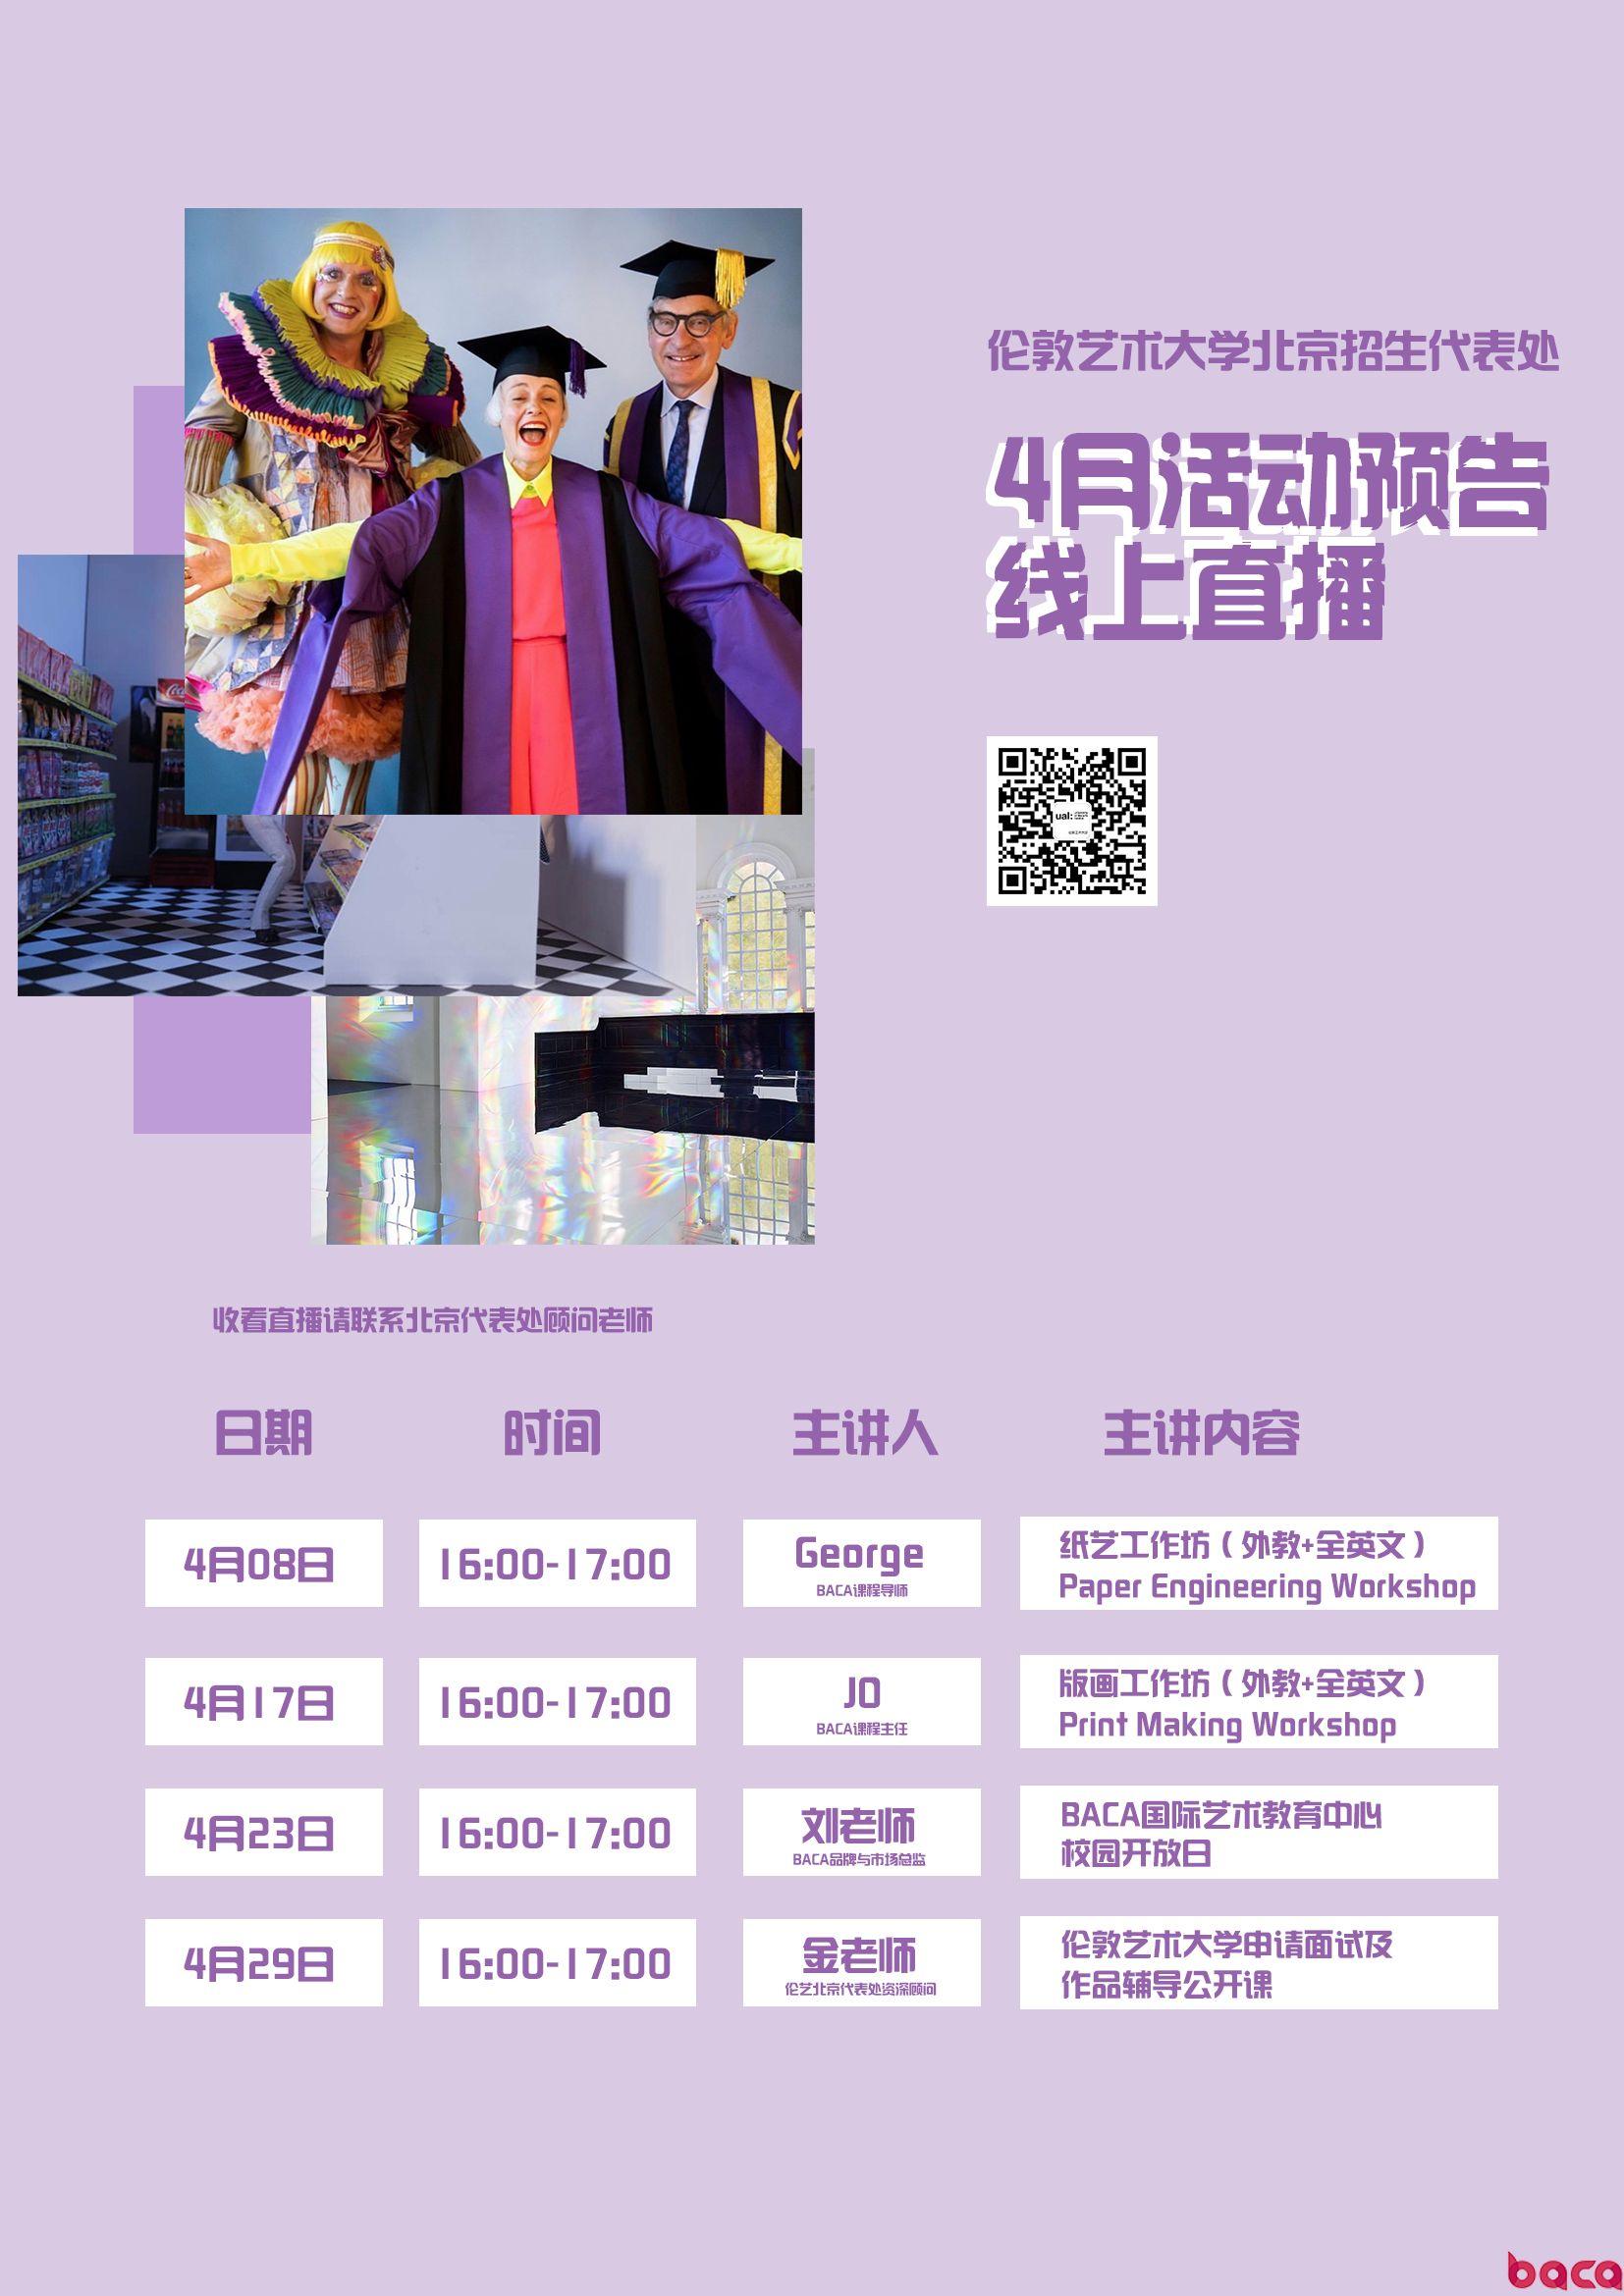 BACA国际艺术高中四月份活动列表|BACA活动